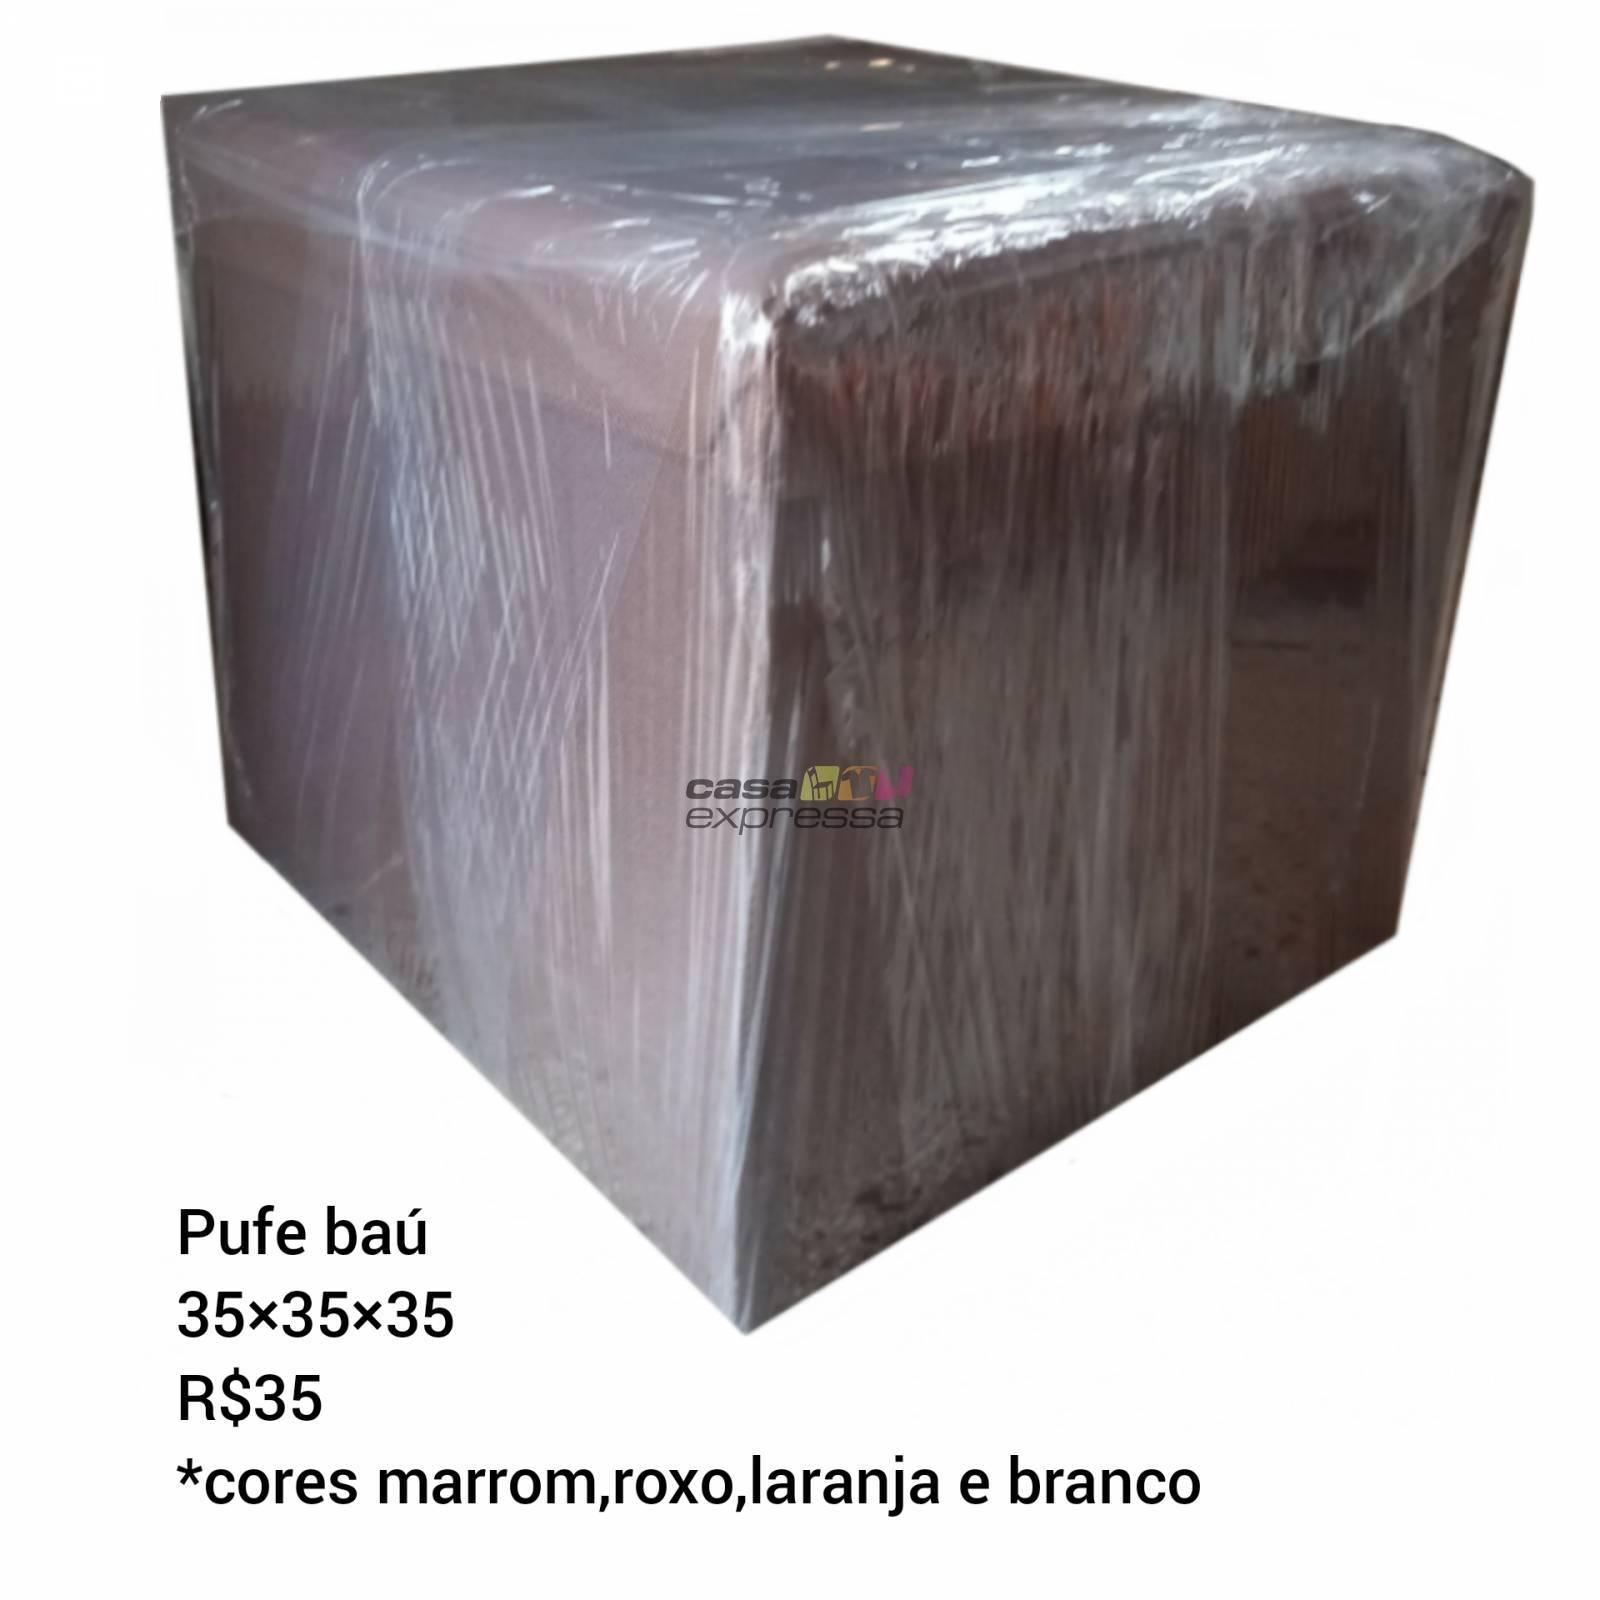 Pufe bau pink, preto ou marron - CASA EXPRESSA